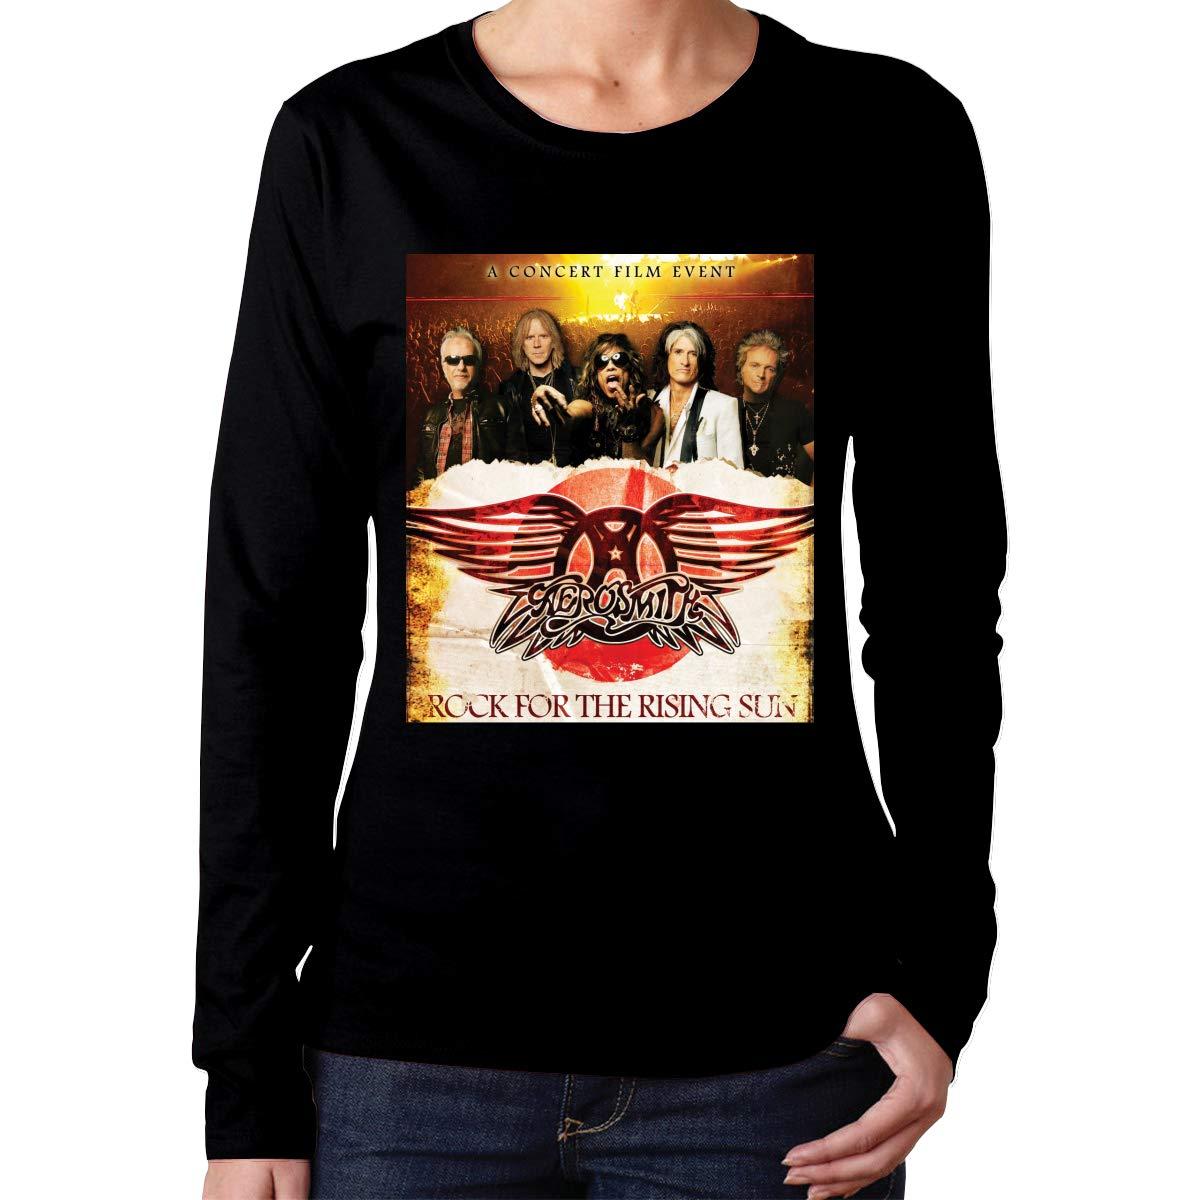 Aerosmith Rock For The Rising Sun Womans Comfortable Casual Shirts